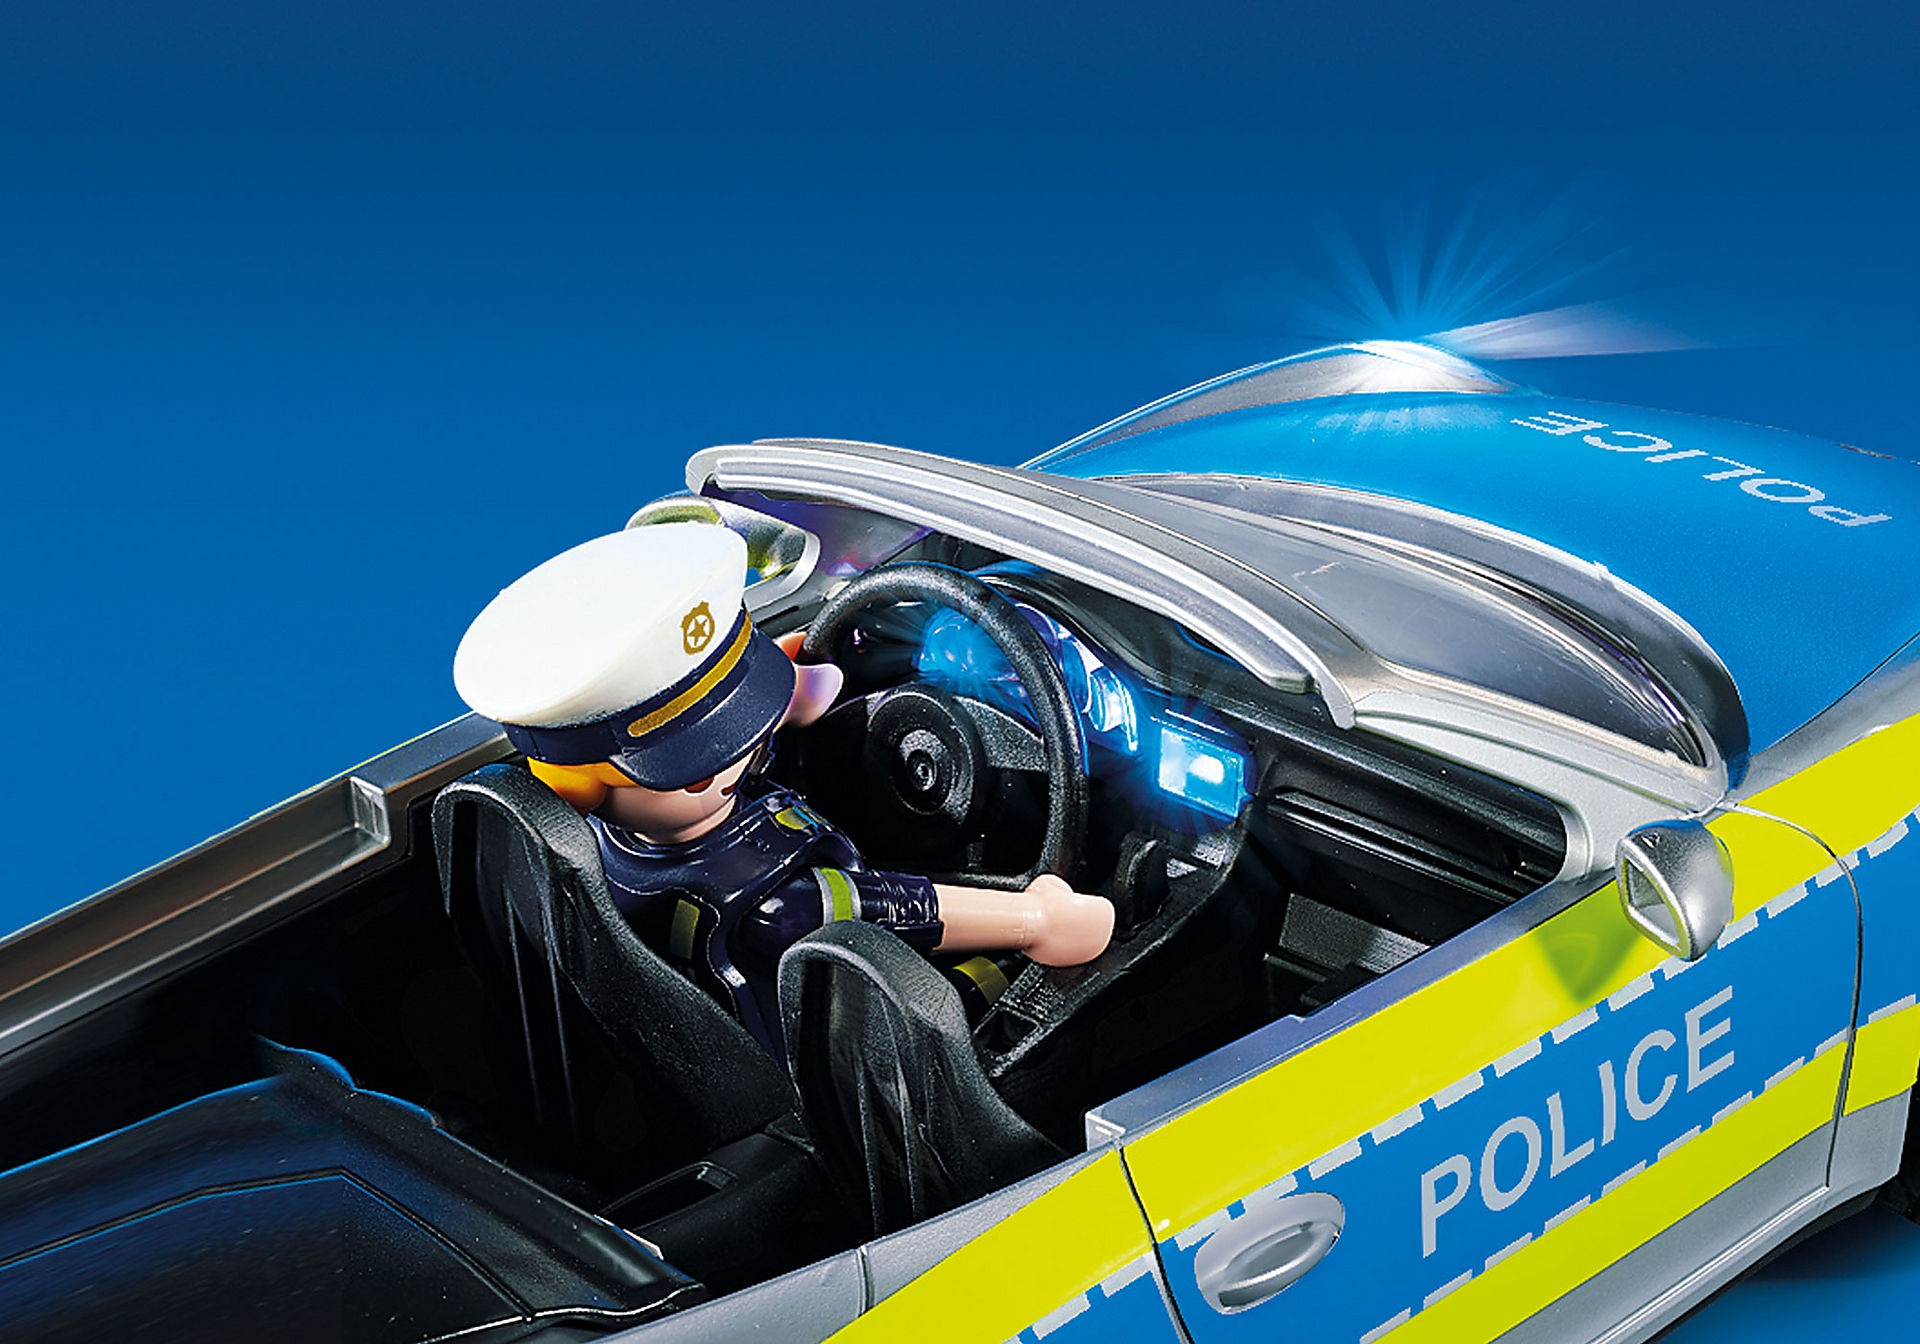 70066 Porsche 911 Carrera 4S Policja zoom image8